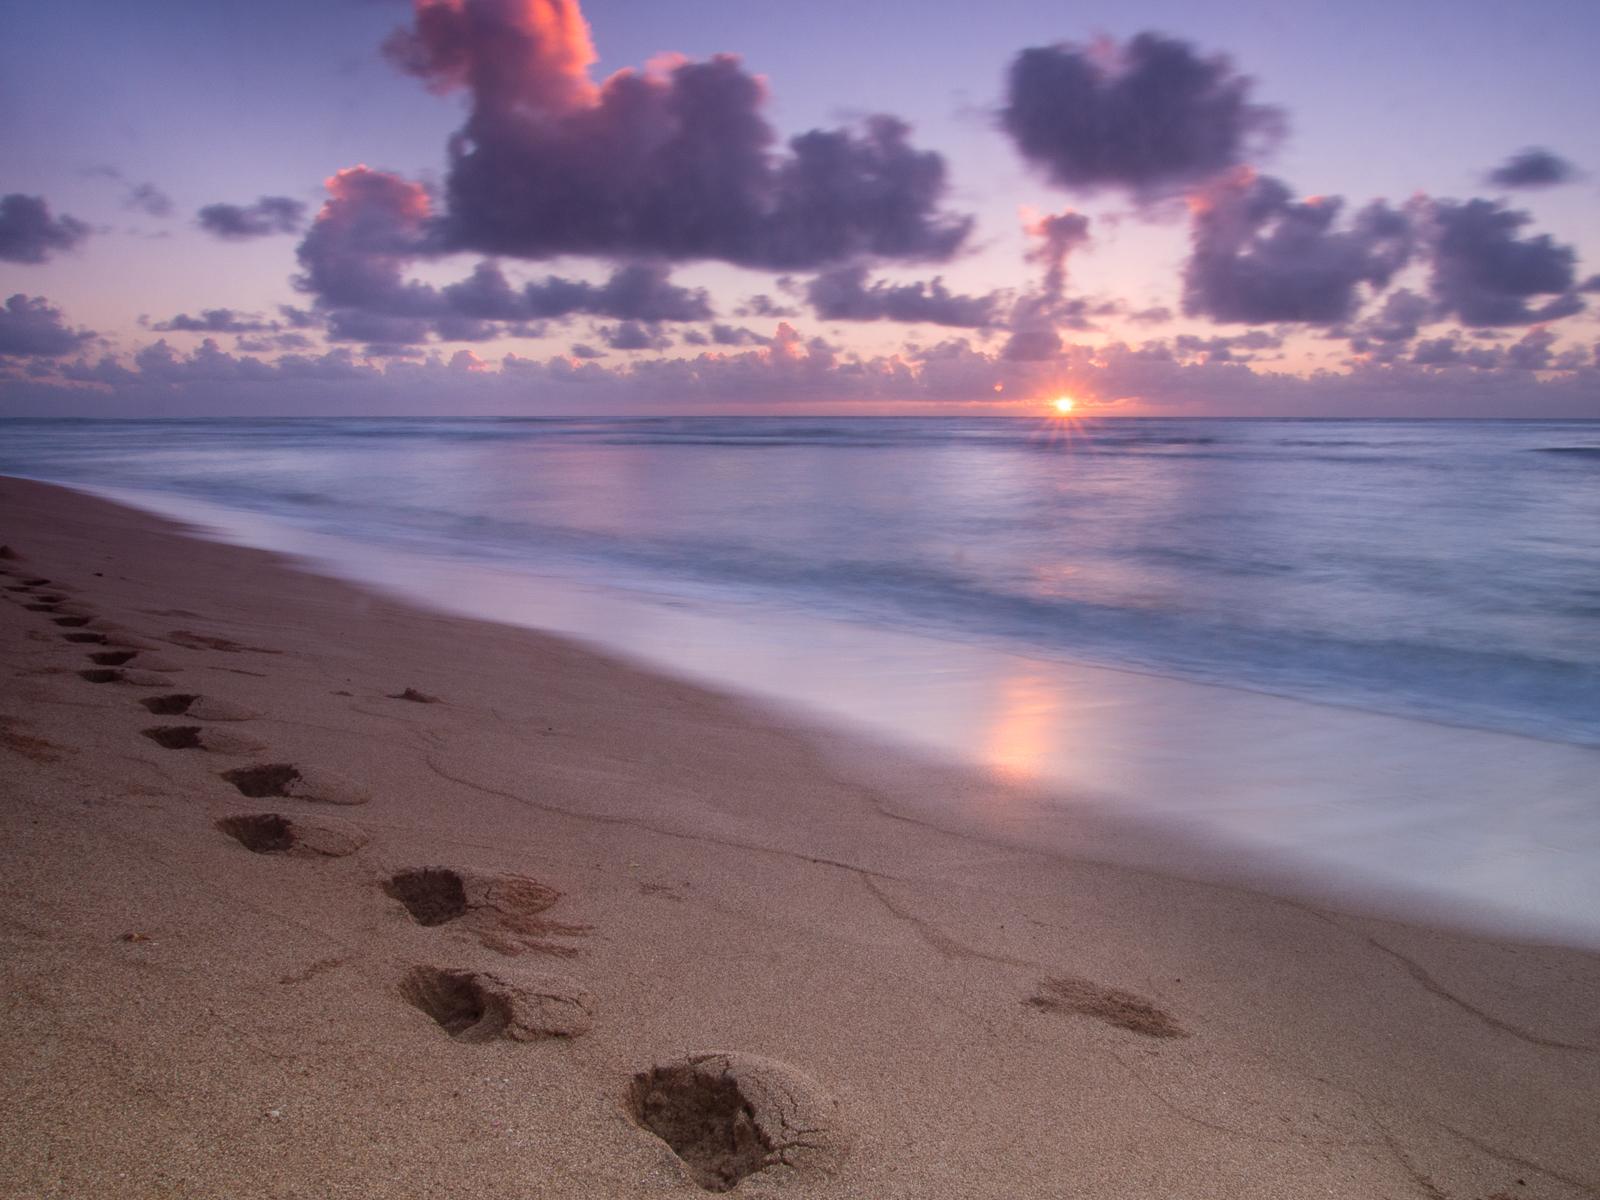 airline tickets for kauai hawaii